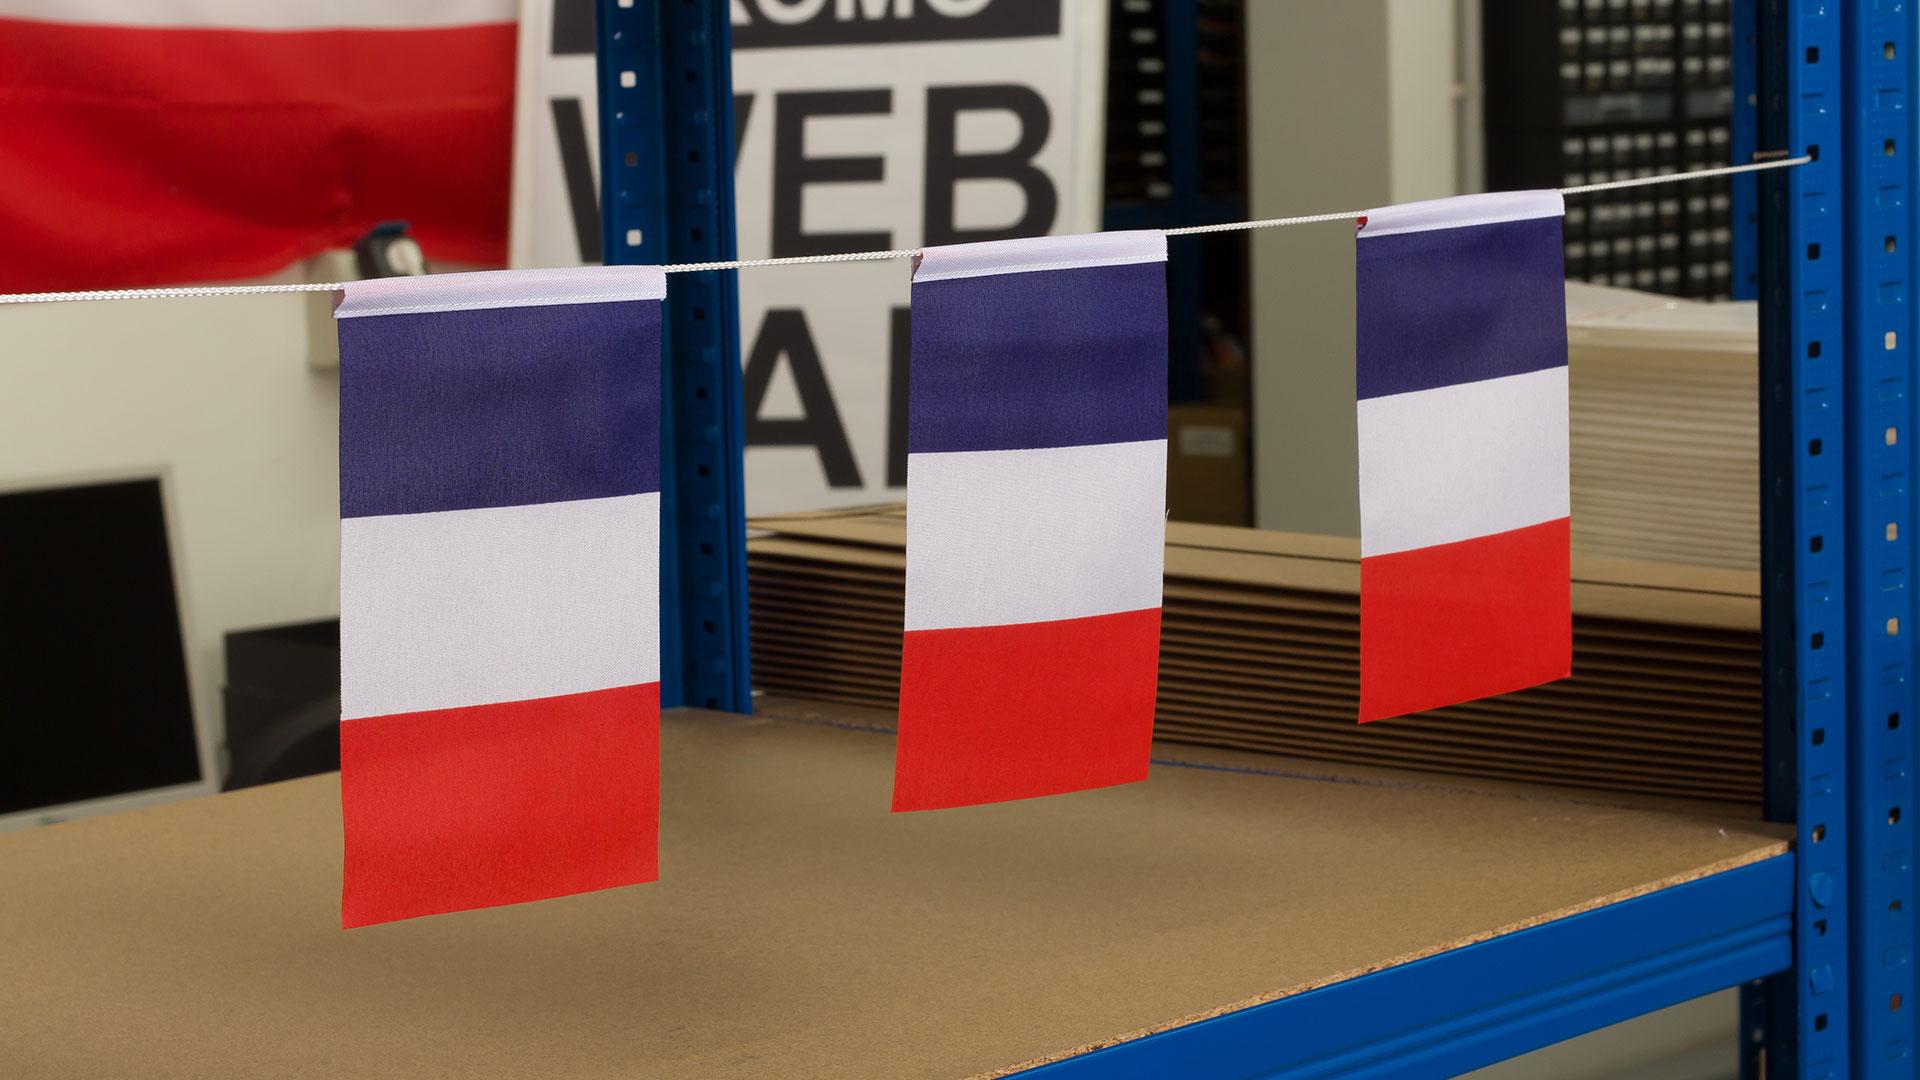 Frankreich f hnchen 10 x 15 cm flaggenplatz Dekoration frankreich